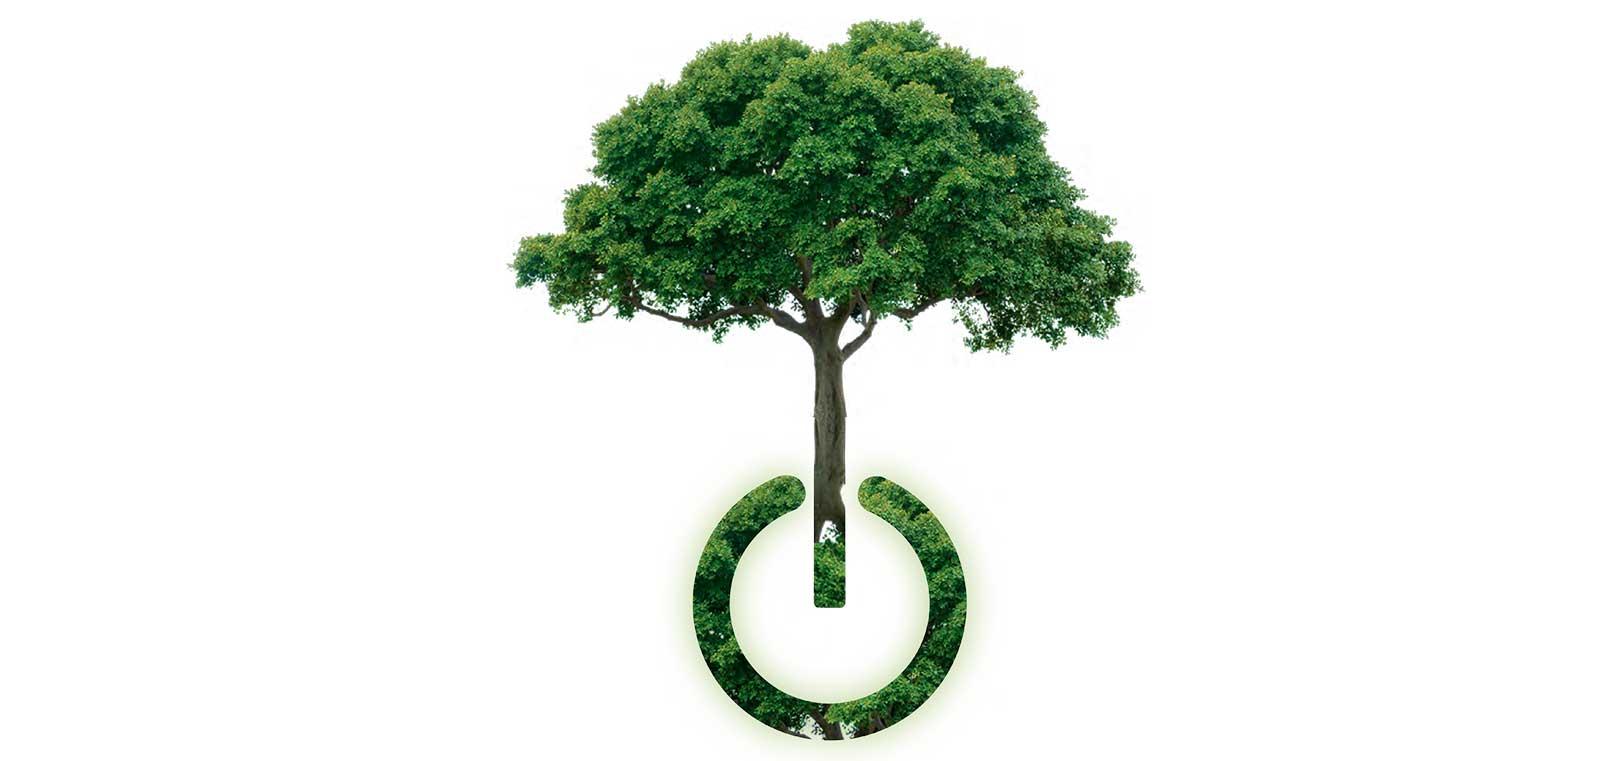 Laguna Lăng Cô CSR, the Energy Saving Campaign